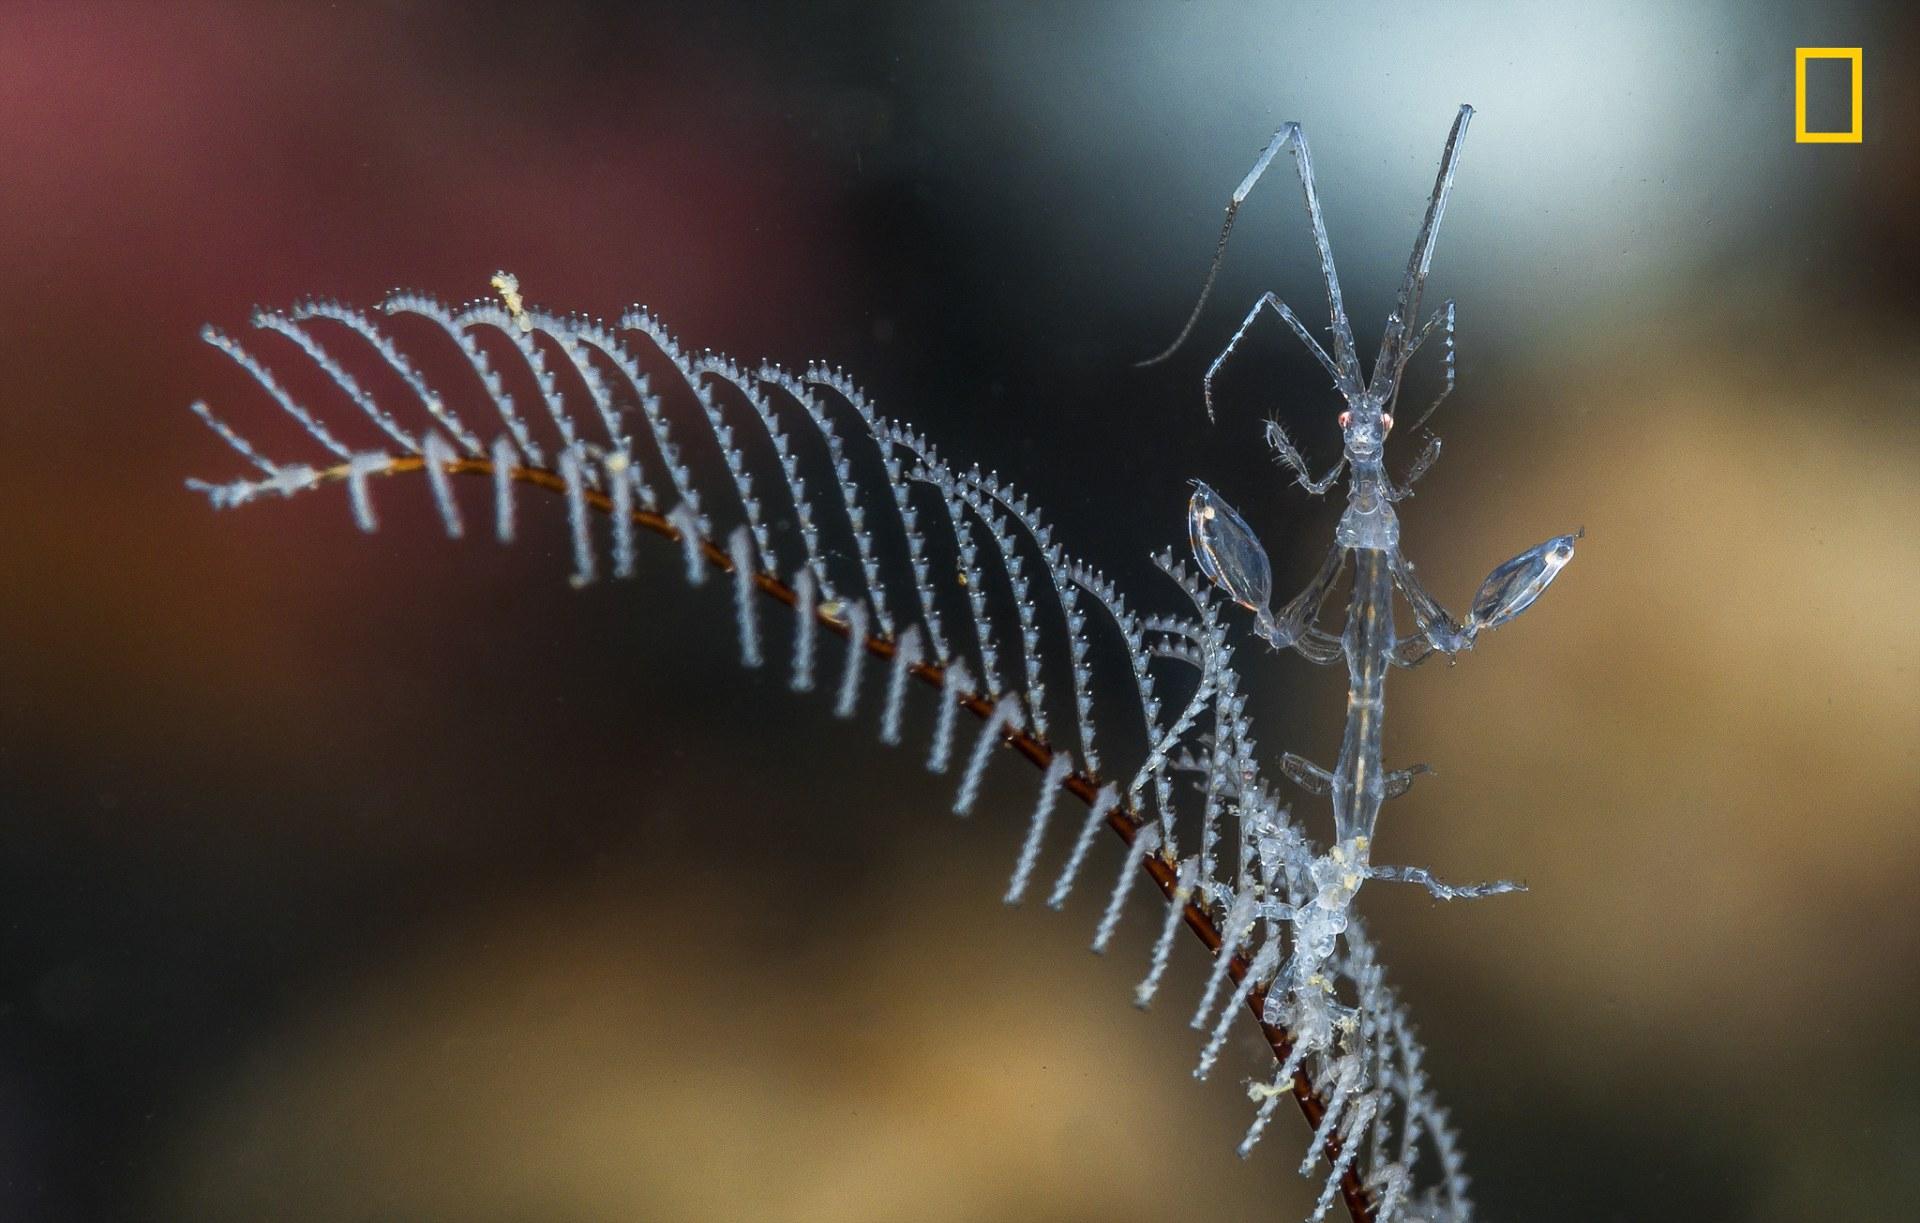 perierga.gr - Το National Geographic παρουσιάζει τις συμμετοχές για τον καλύτερο φωτογράφο φύσης!